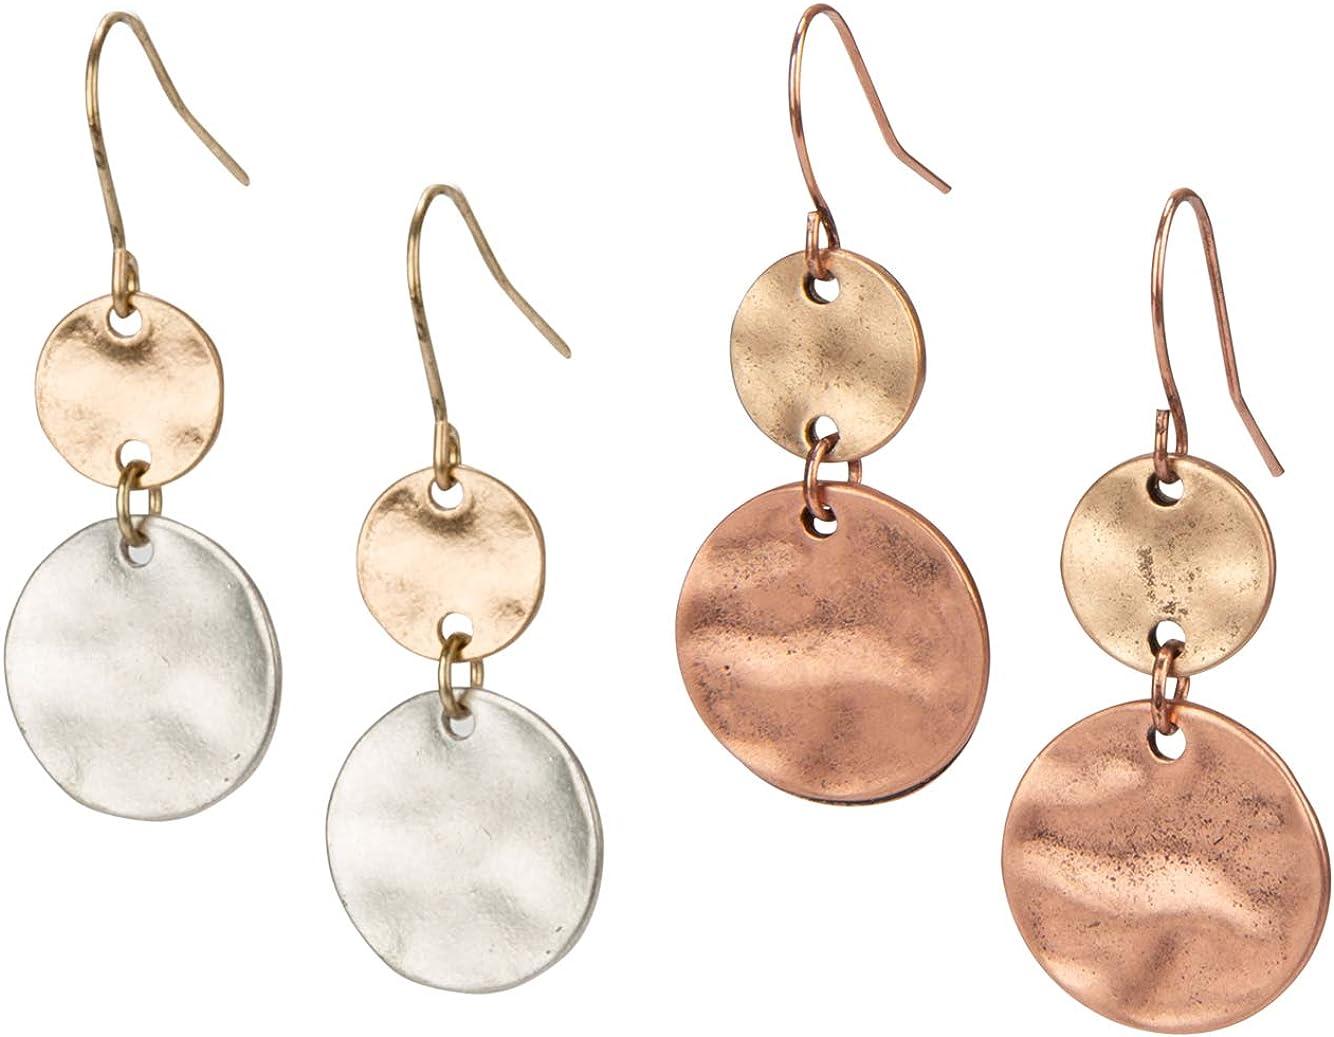 Popular standard SPUNKYsoul Boho Disc Light Weight for Women Earrings 2 Pack Fees free